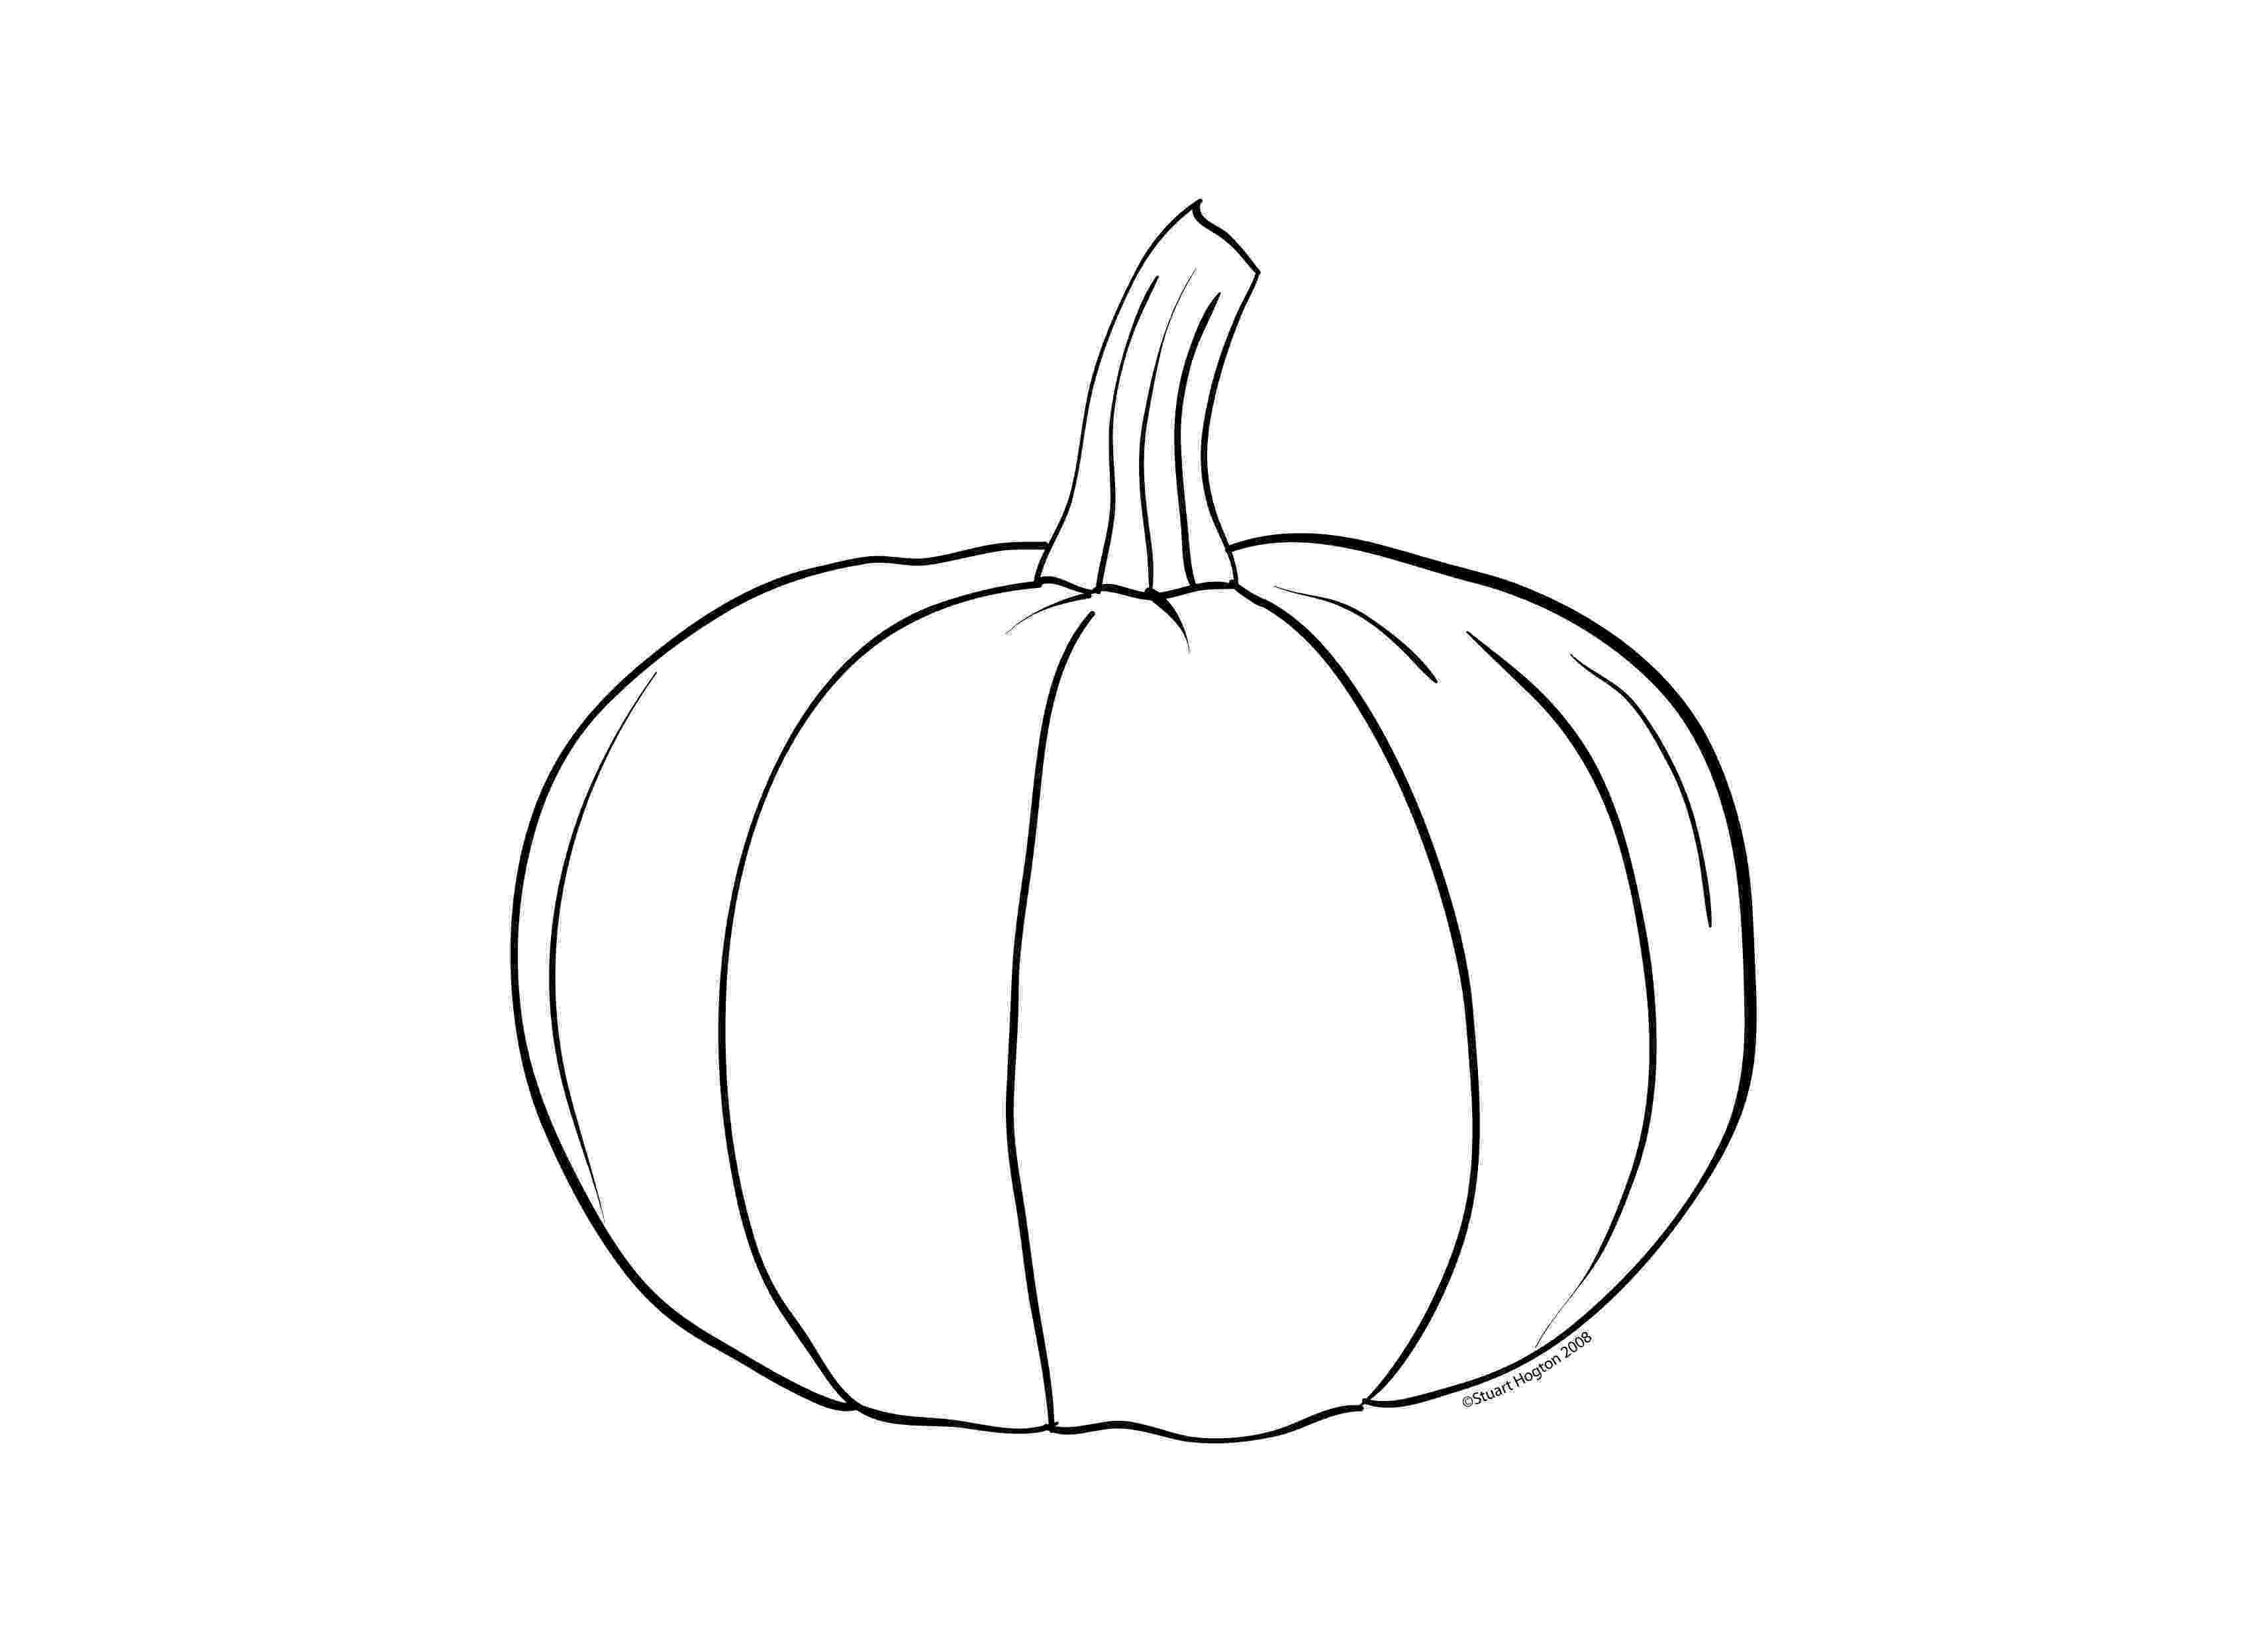 blank pumpkin best pumpkin outline printable 22941 clipartioncom blank pumpkin